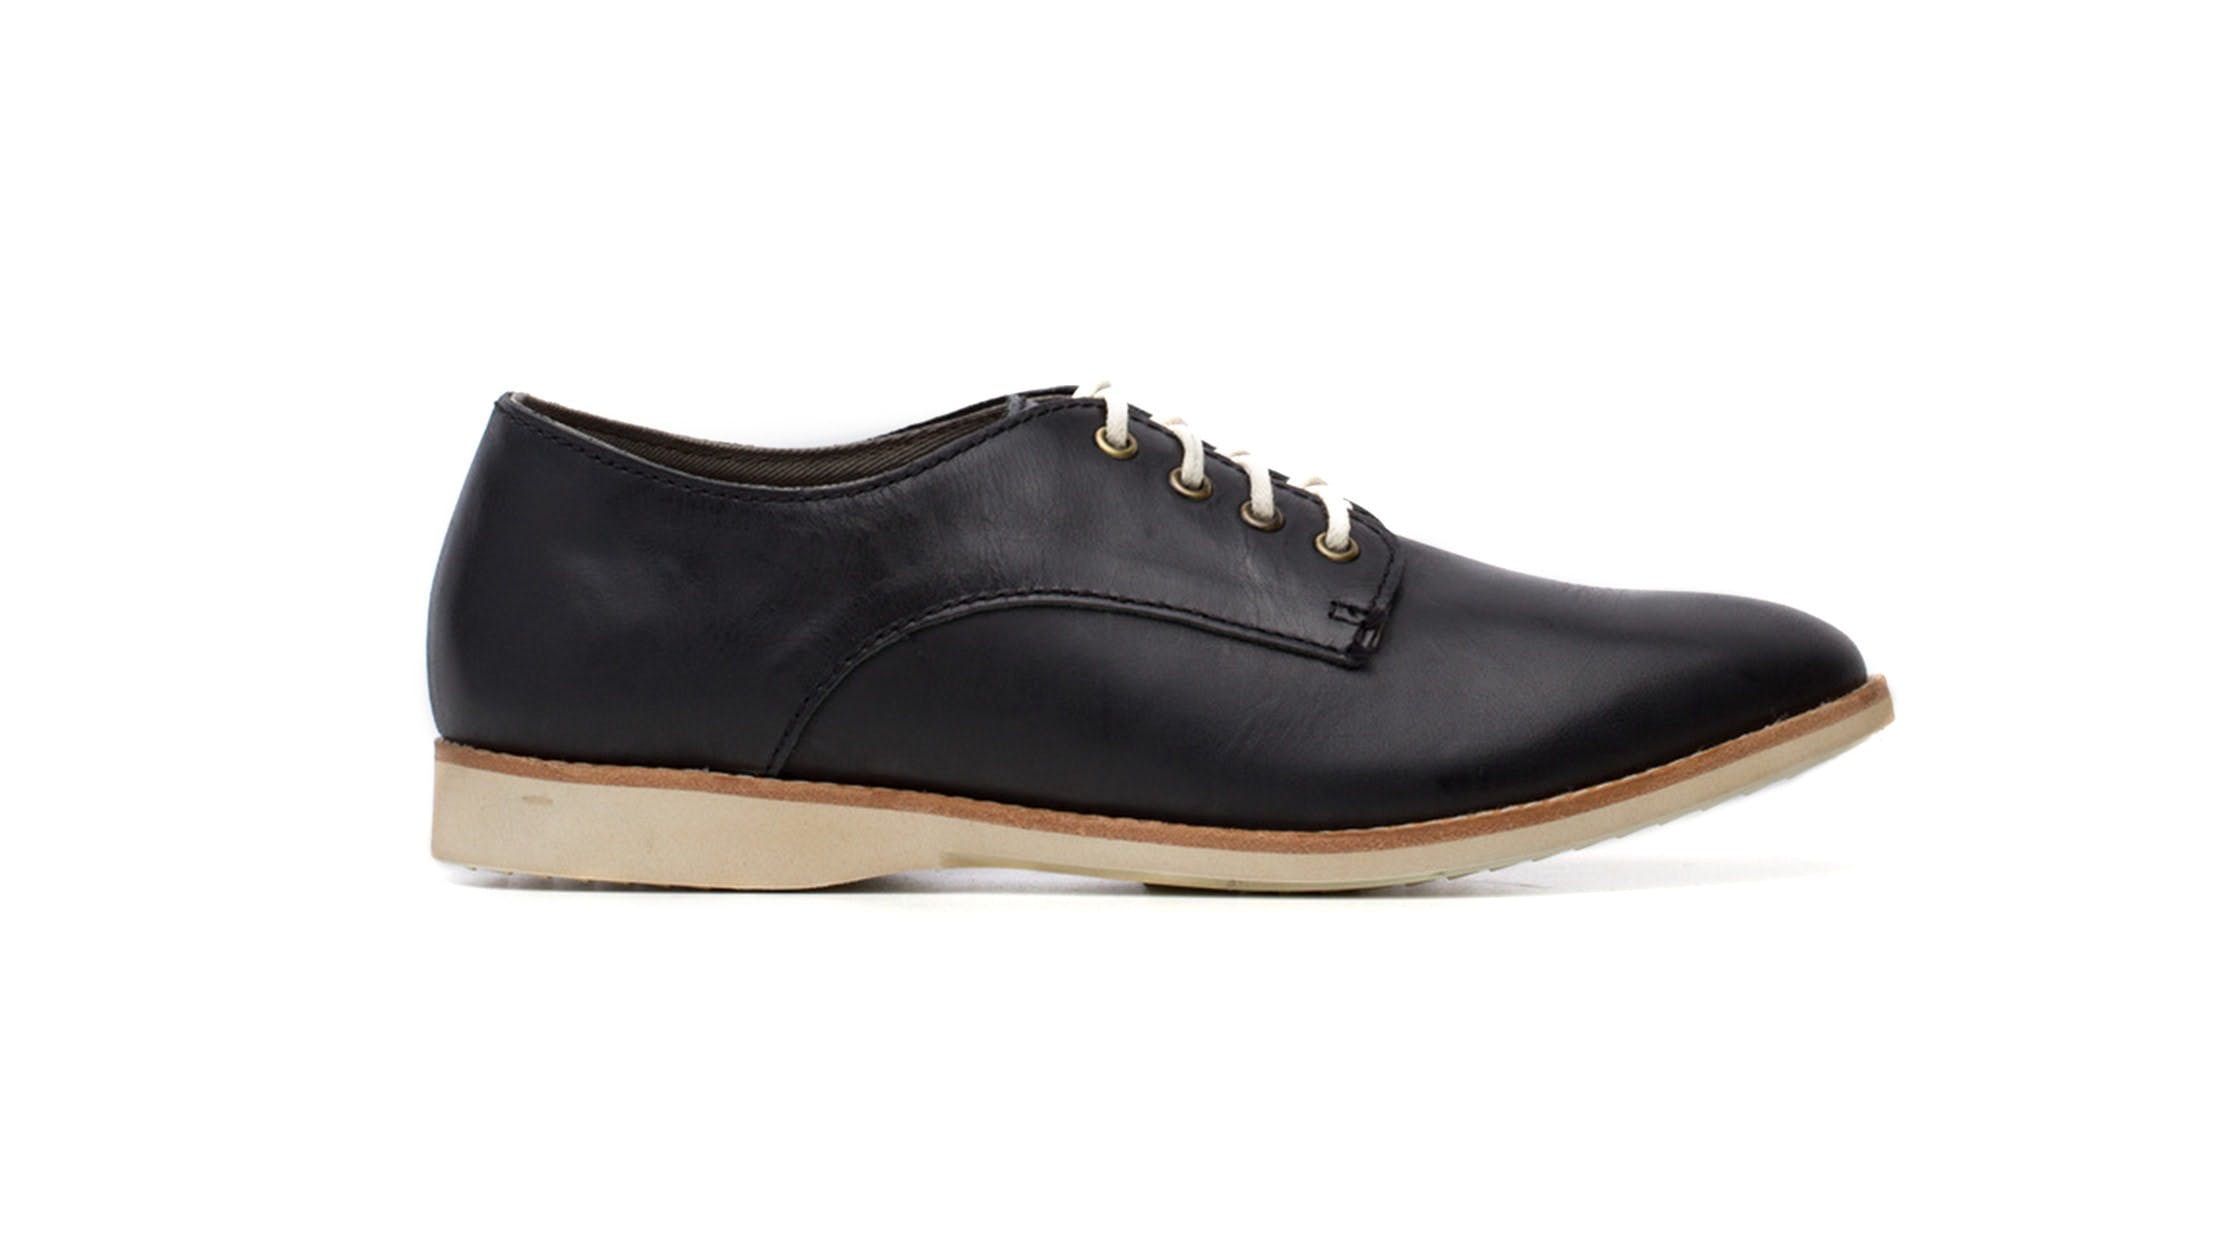 Rollie Derby Shoes Black